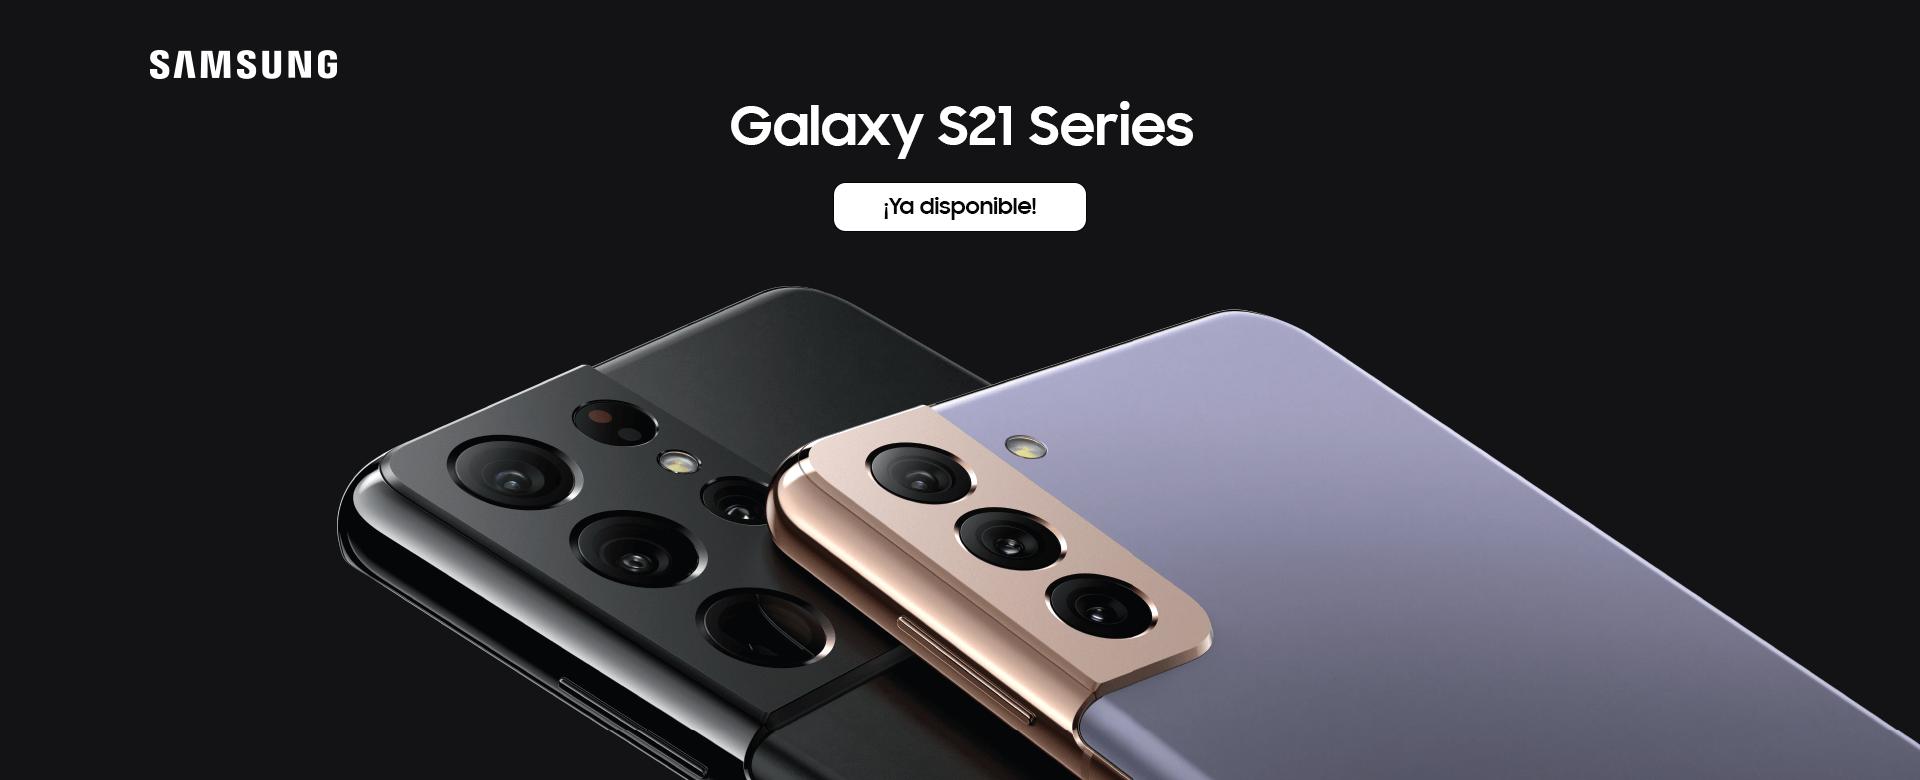 KeyVisual Galaxy S21